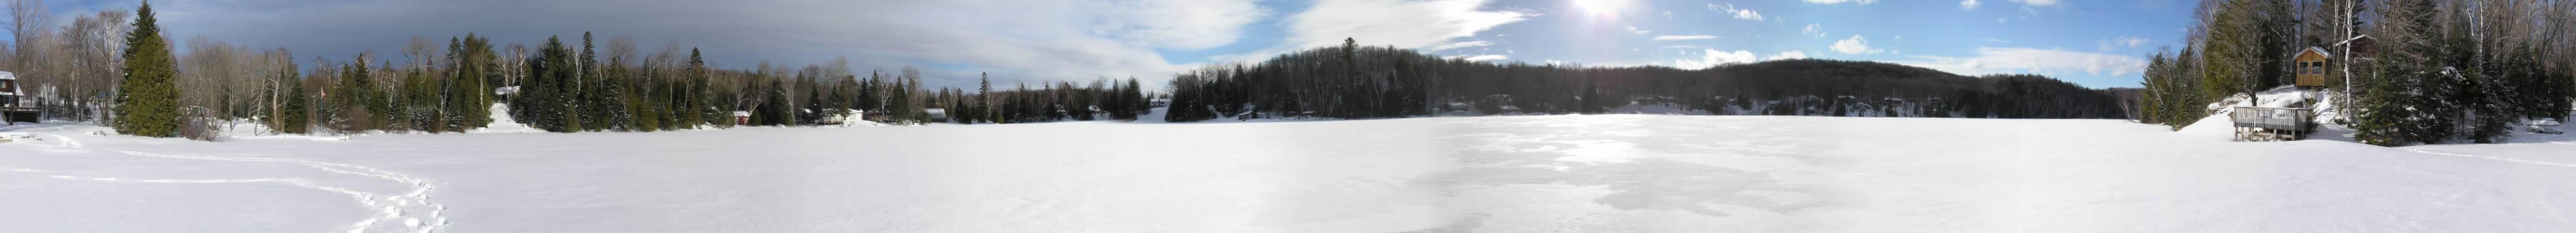 Panoramic View of Salmon Trout Lake, Bancroft Ontario